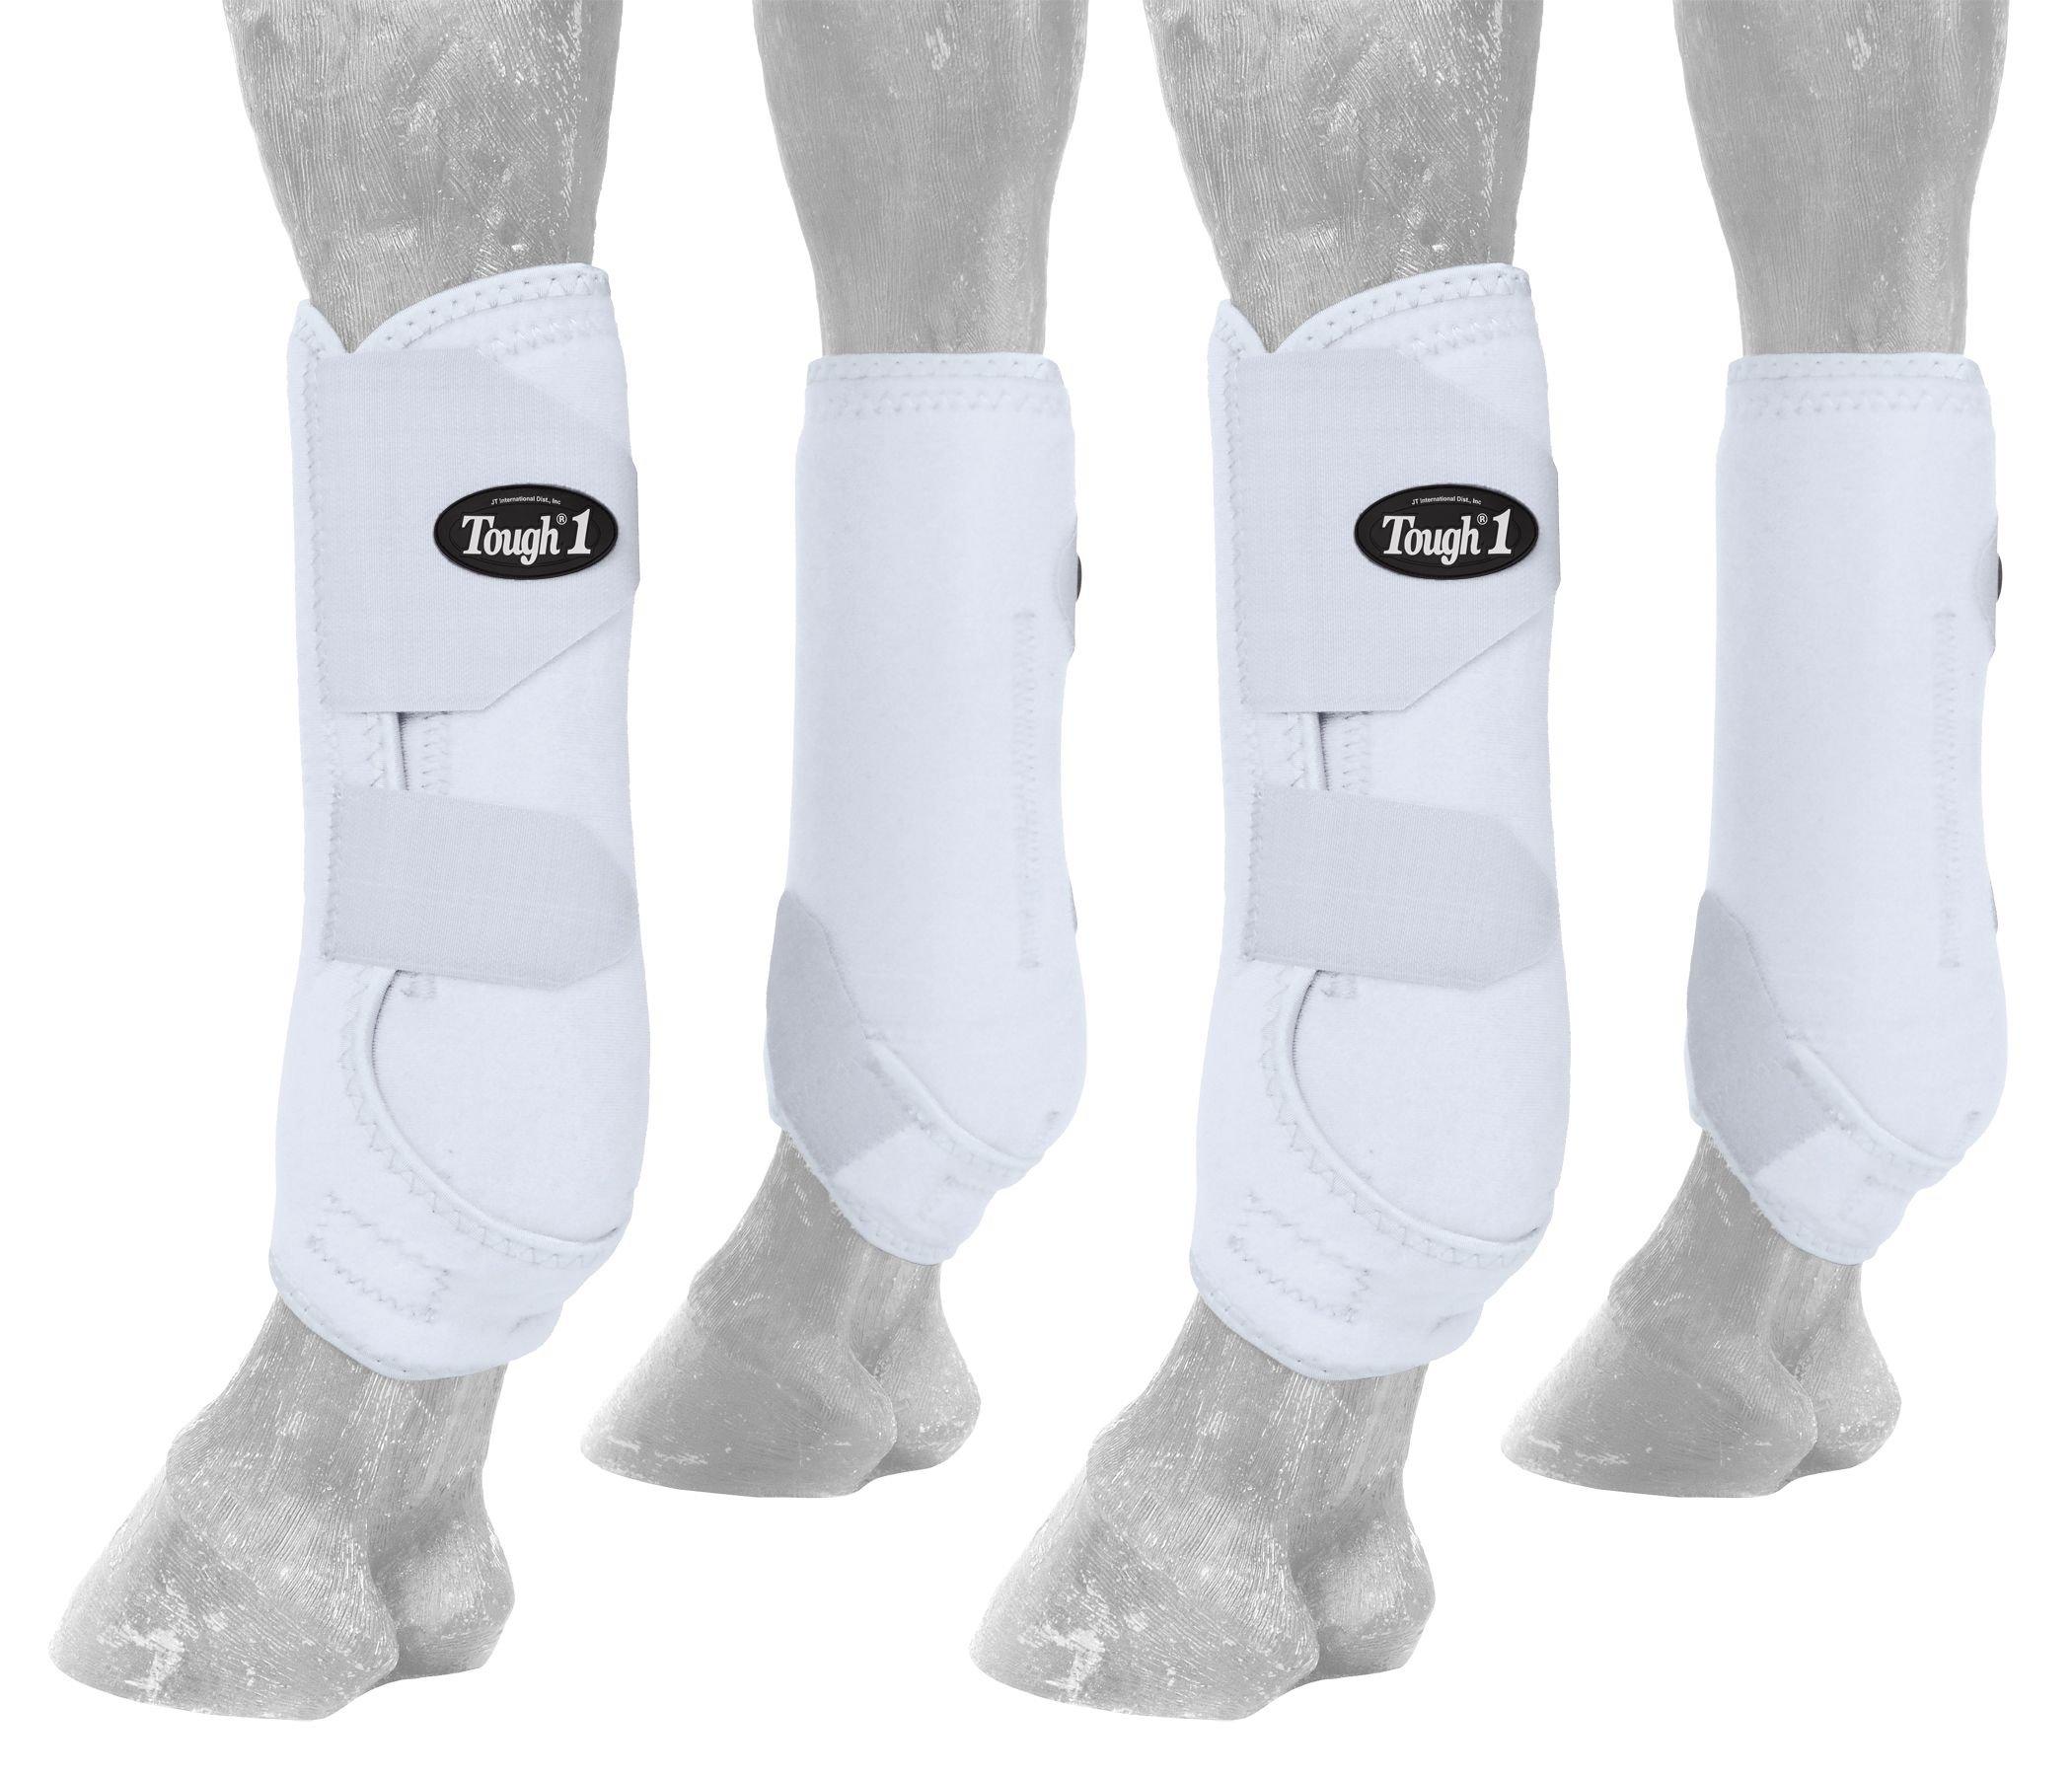 Tough 1 Extreme Vented Sport Boots Set, White, Medium